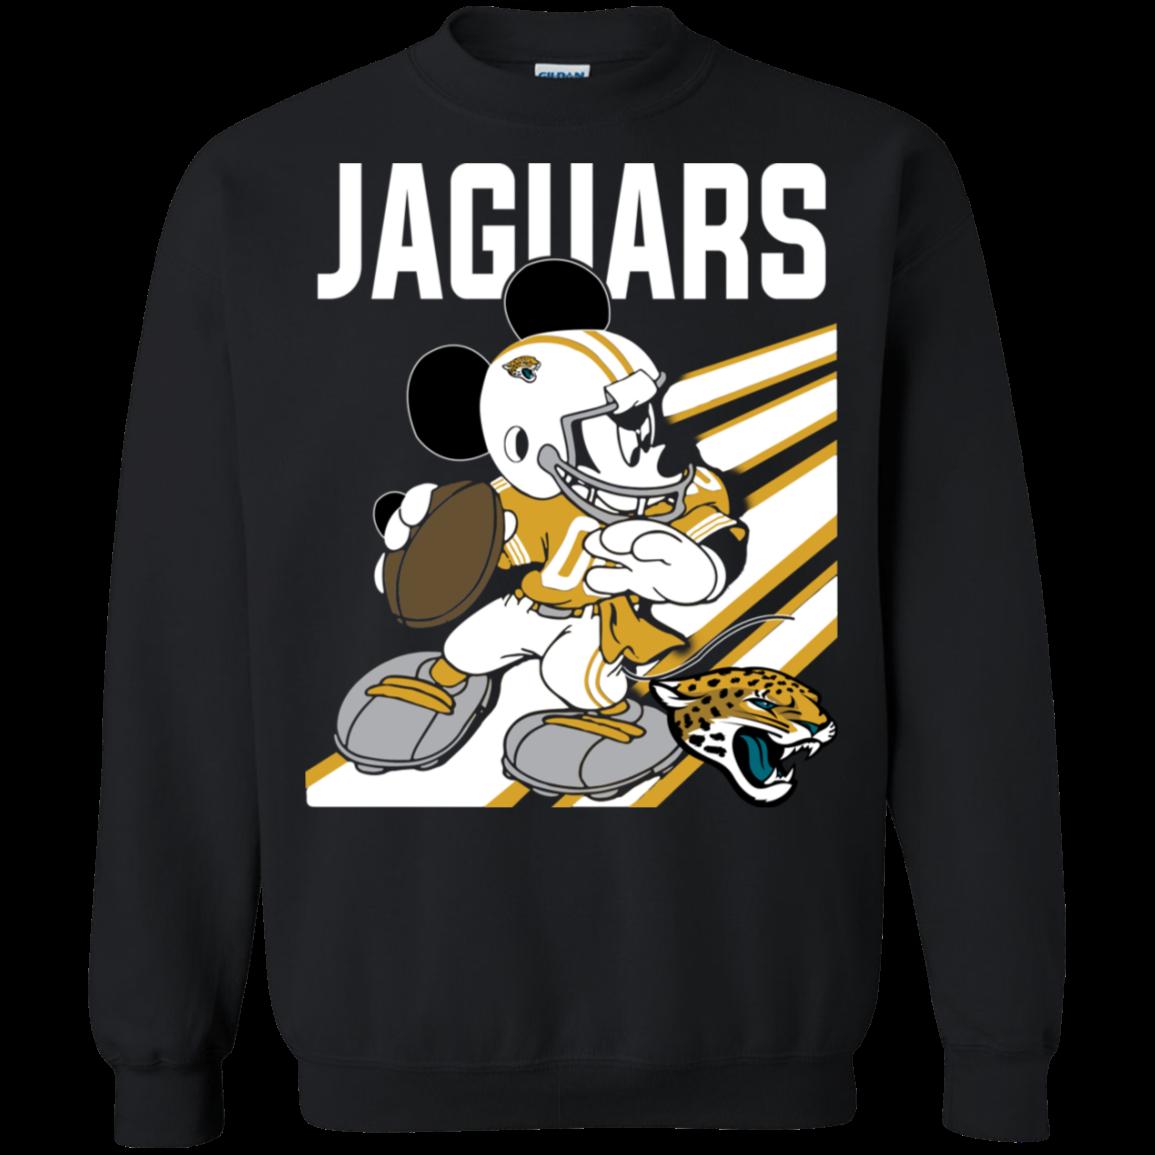 Jacksonville Jaguars Mickey Mouse Disney Nfl Shirt